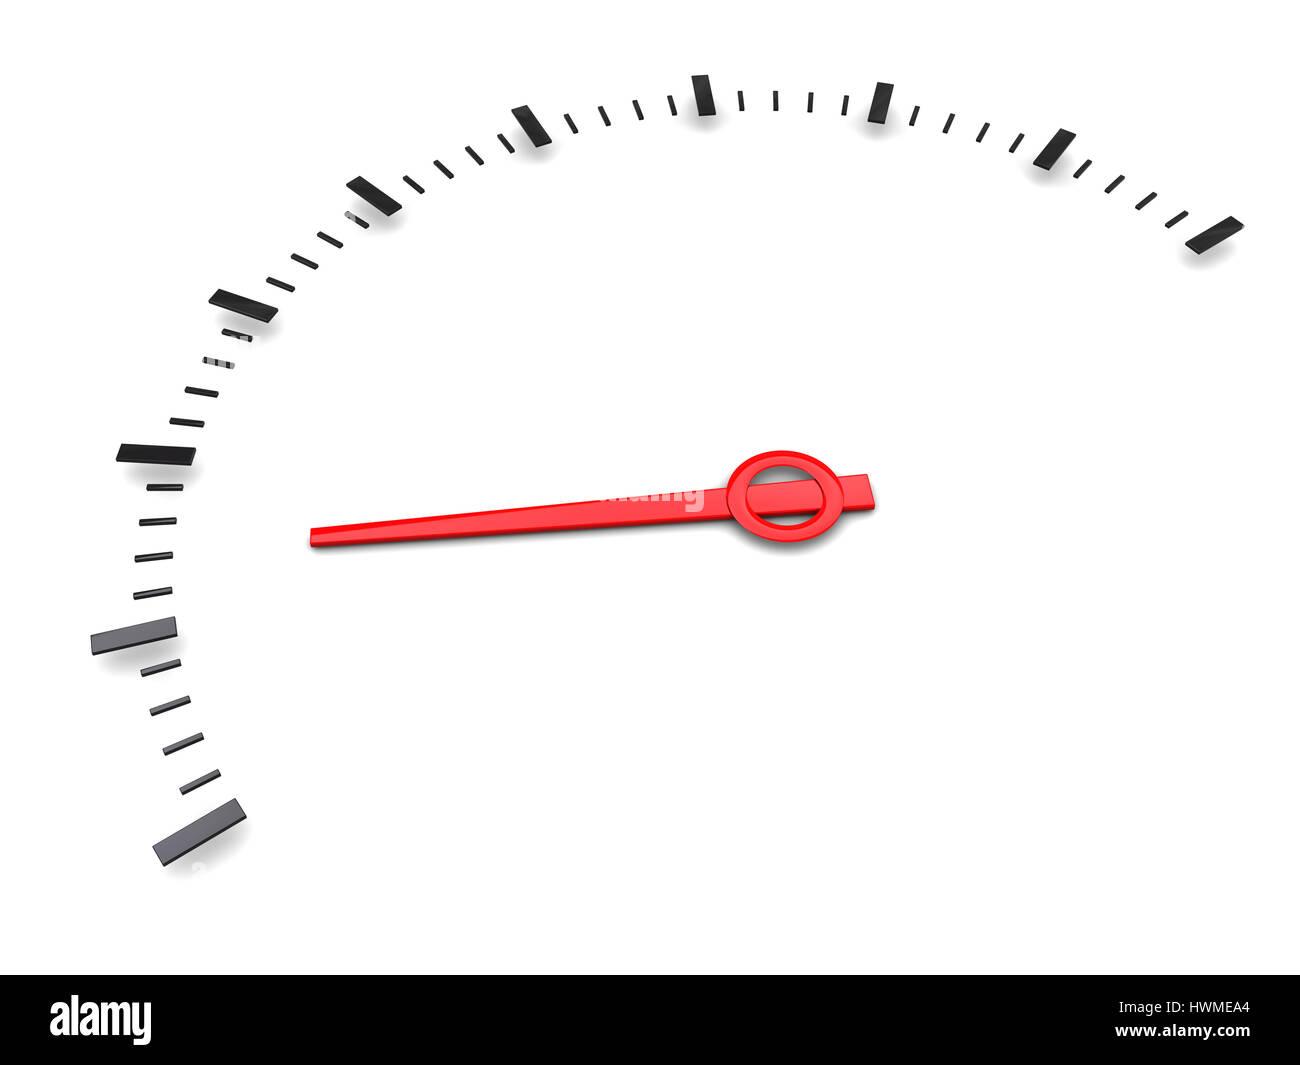 3d illustration of simple meter gauge over white background - Stock Image